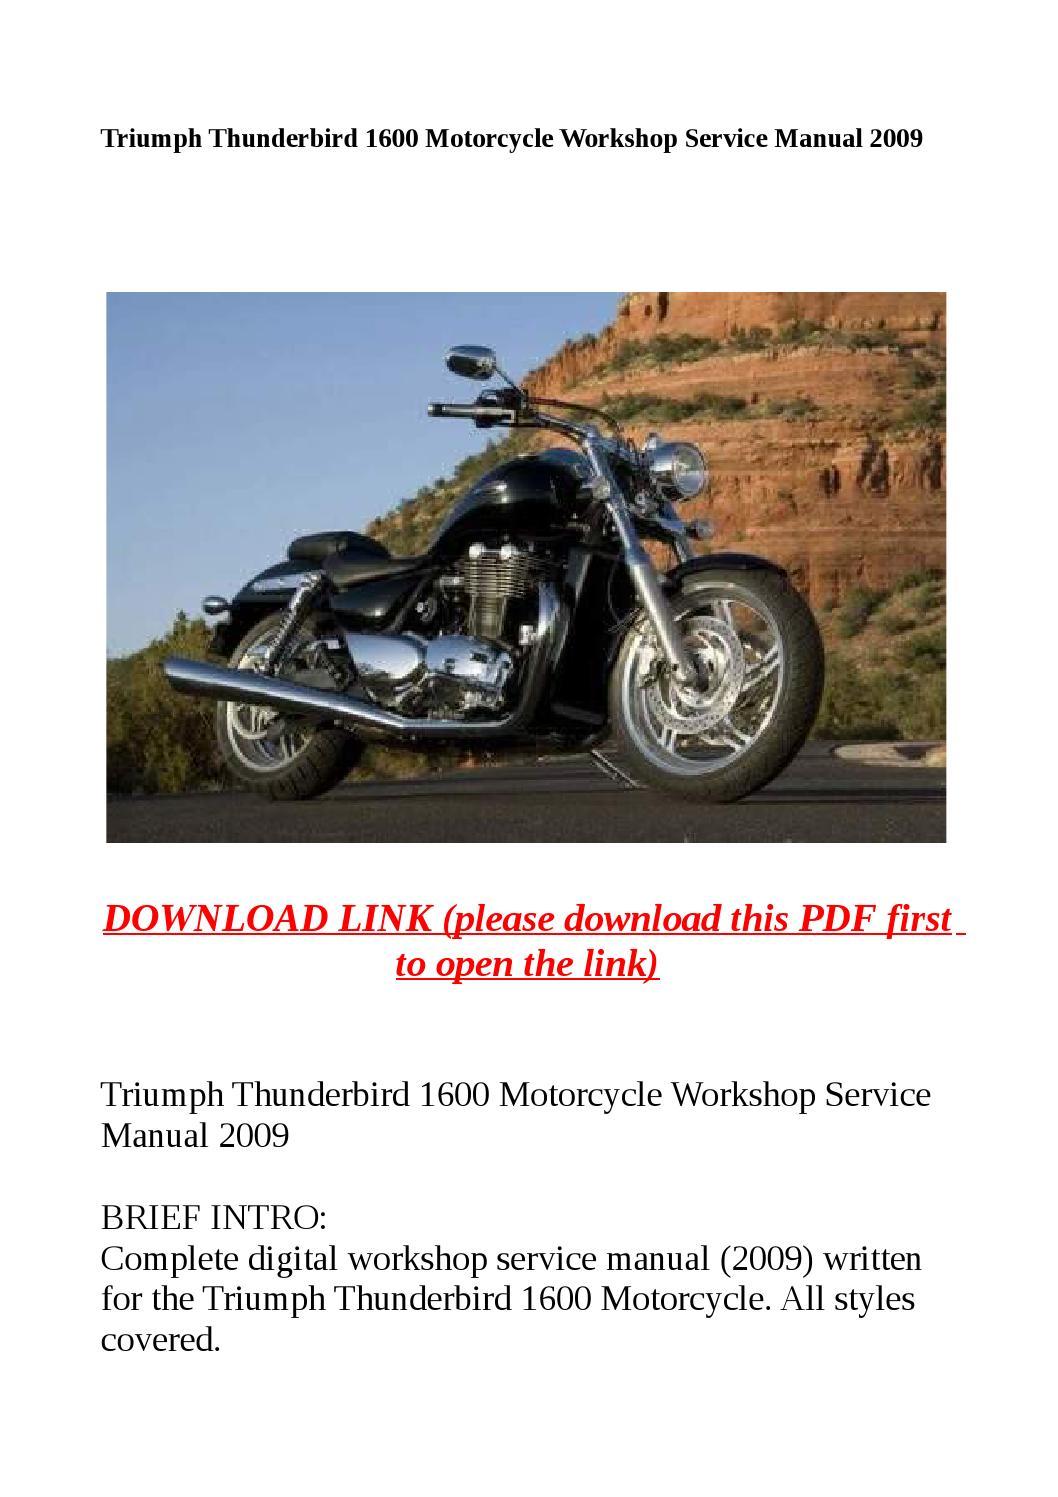 Triumph Thunderbird 1600 Motorcycle Workshop Service